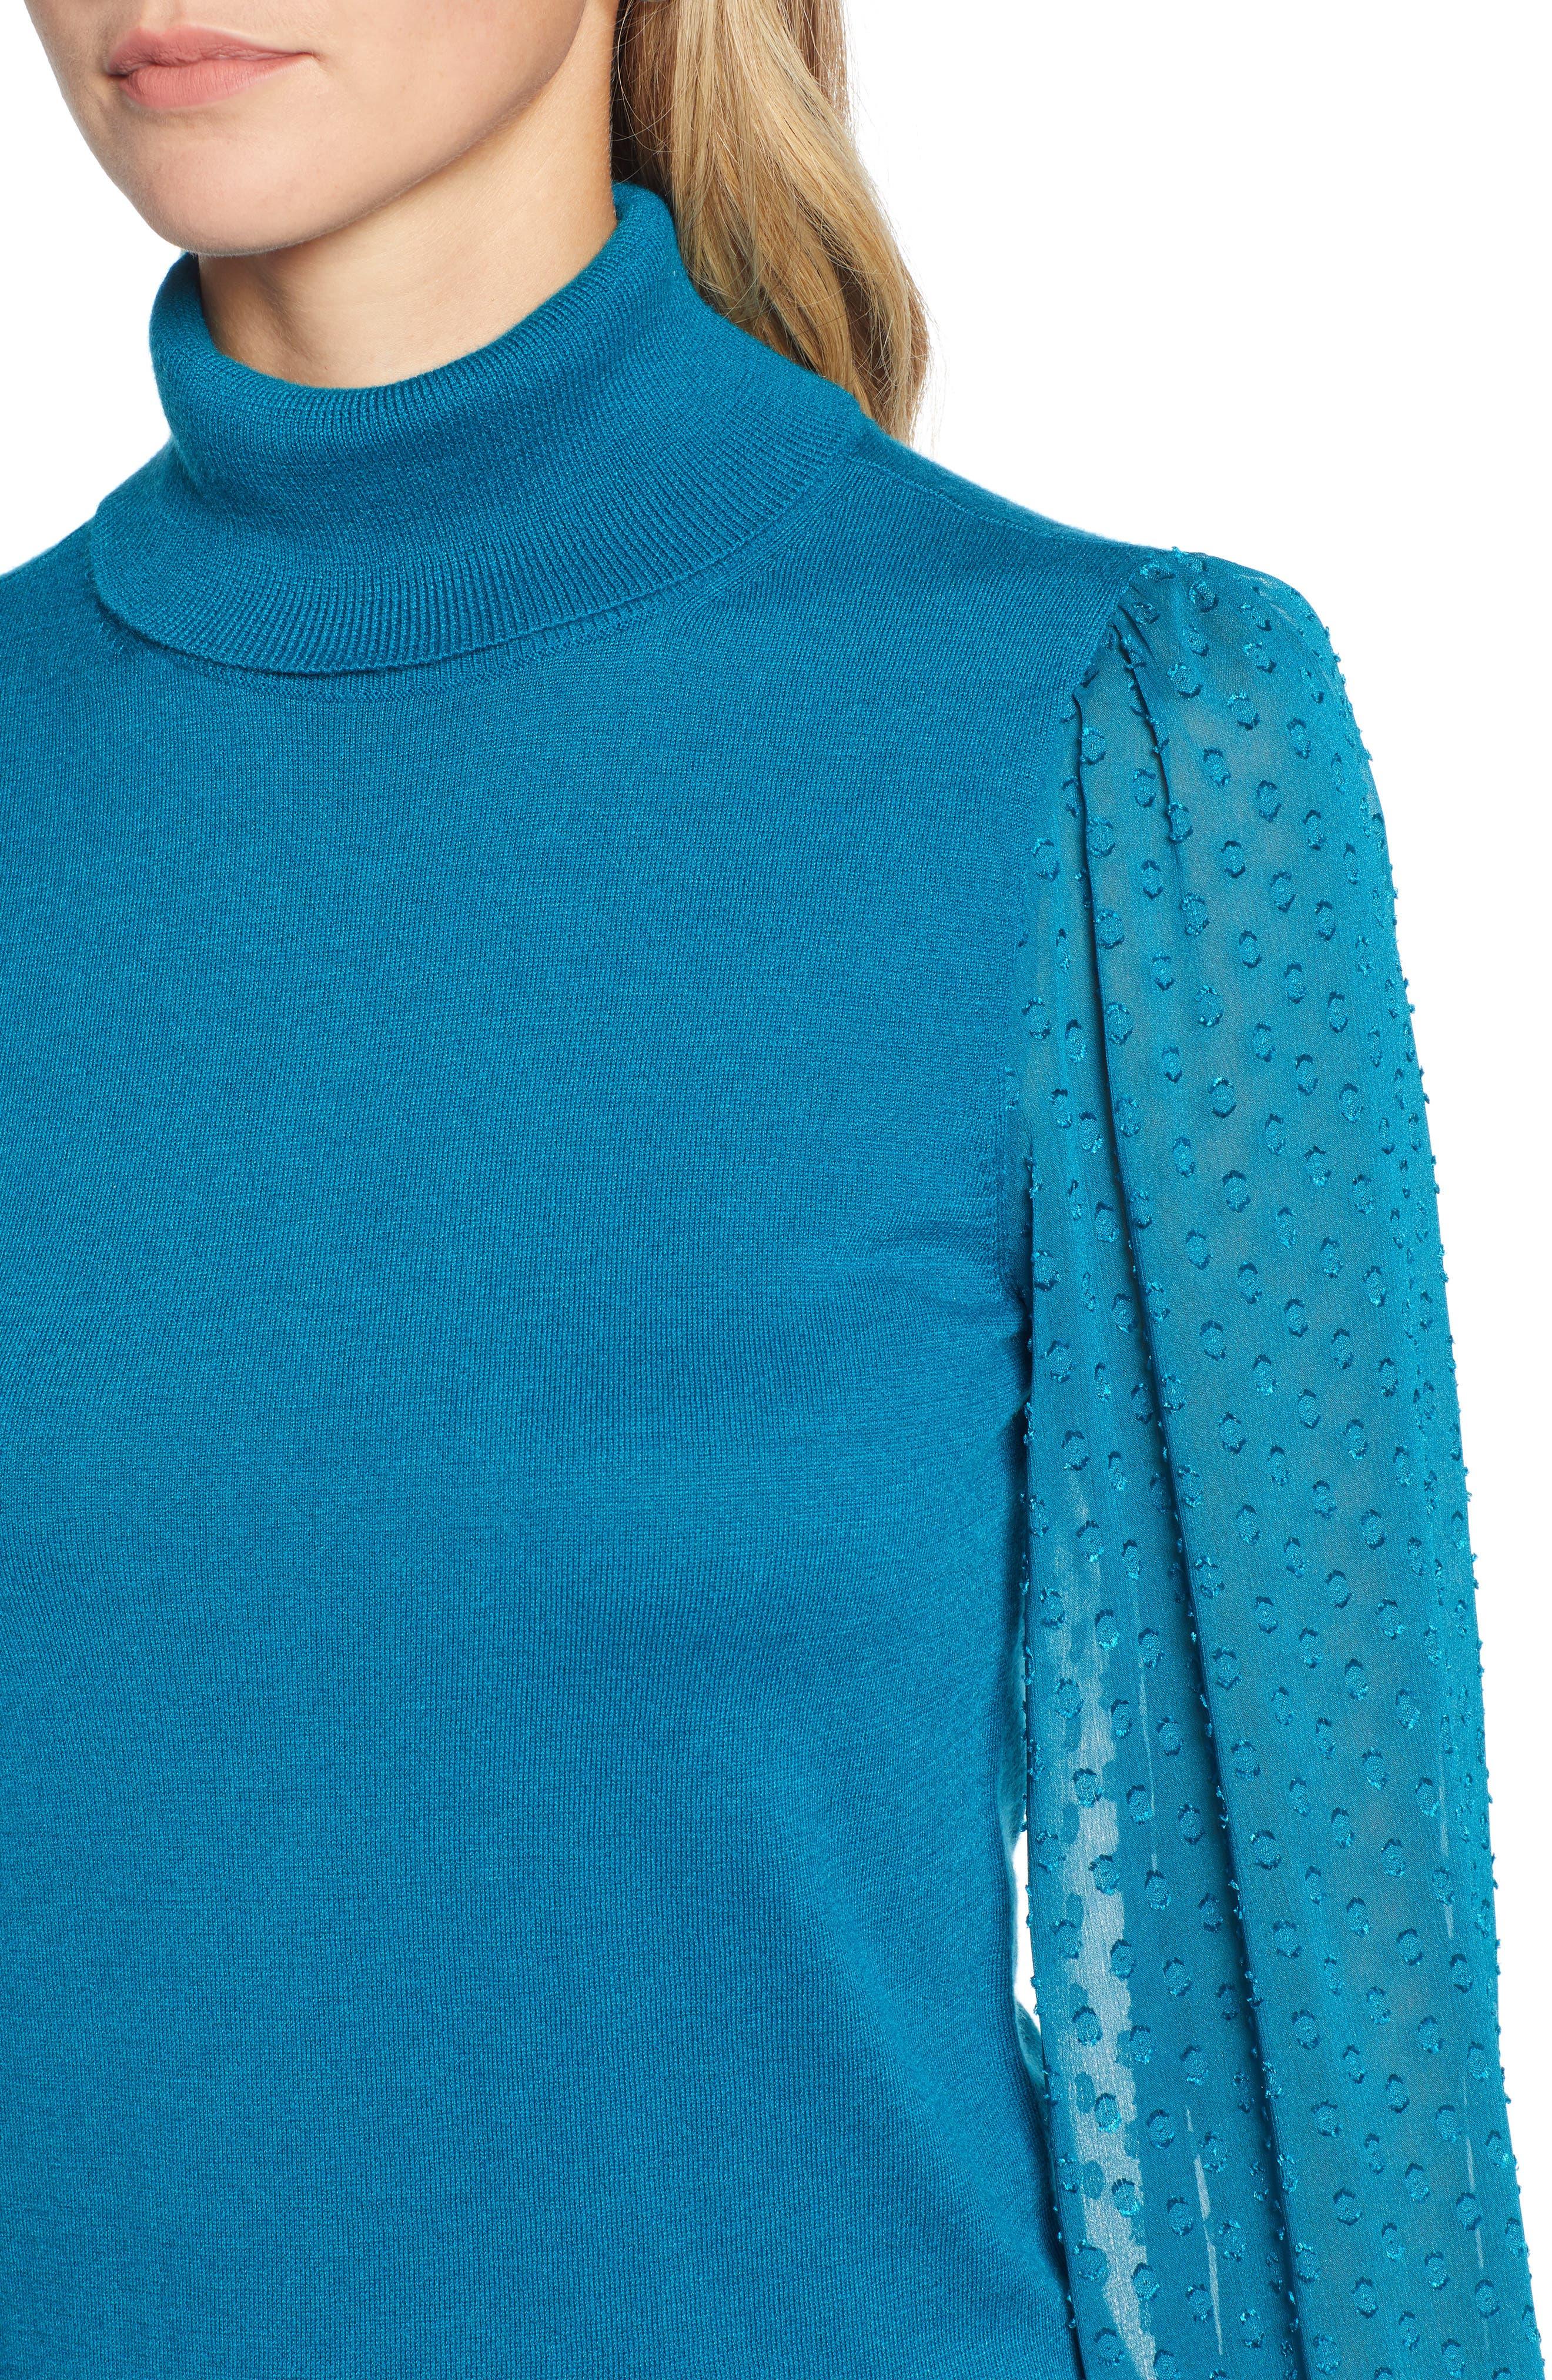 Sheer Sleeve Turtleneck Sweater,                             Alternate thumbnail 4, color,                             449